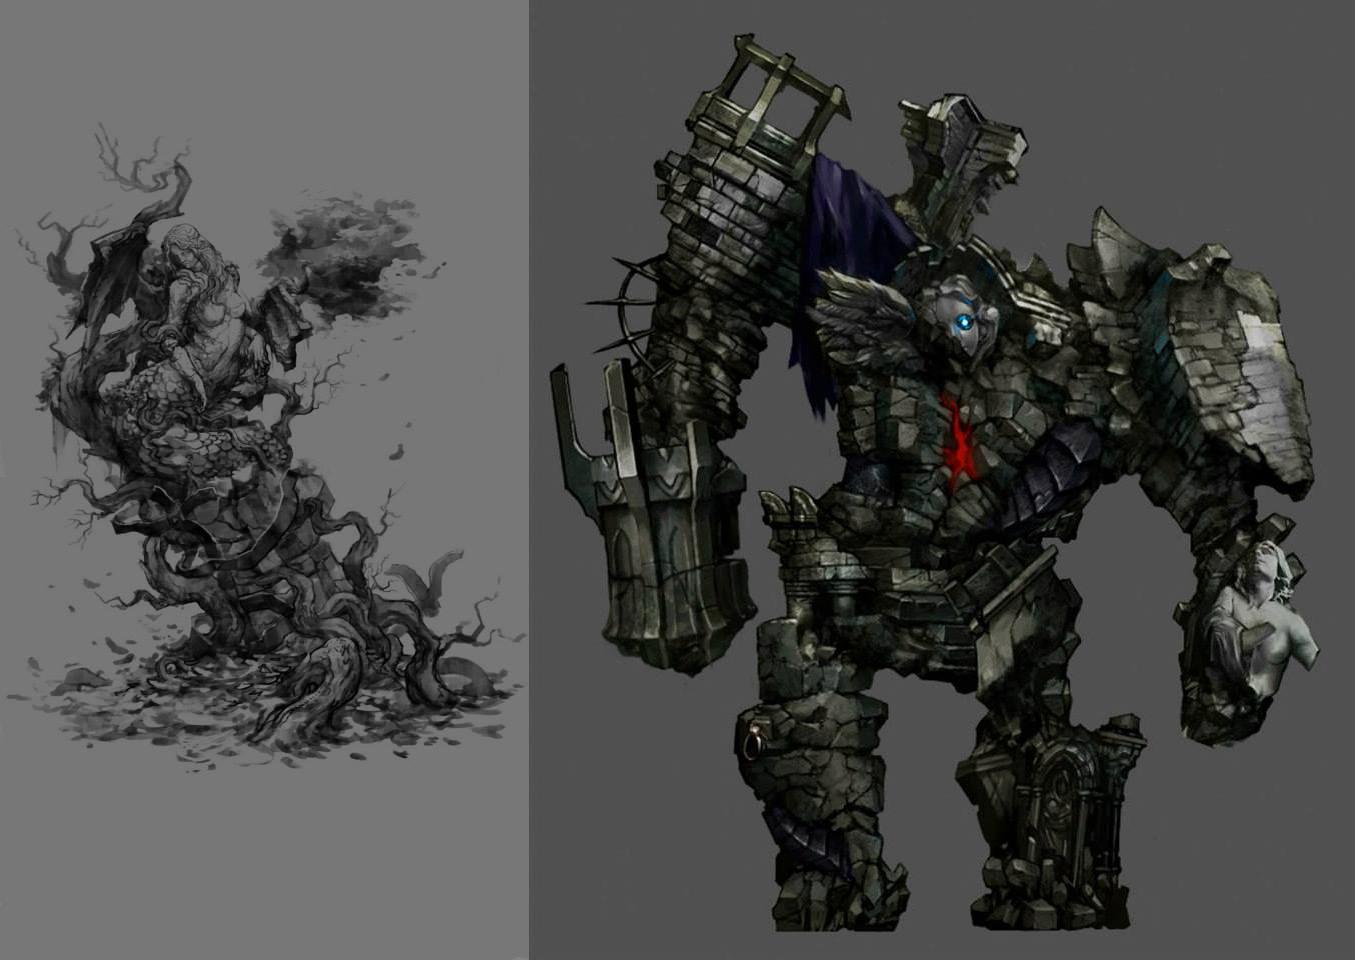 Tajemně krásné artworky z Castlevania: Lords of Shadow 2 86792